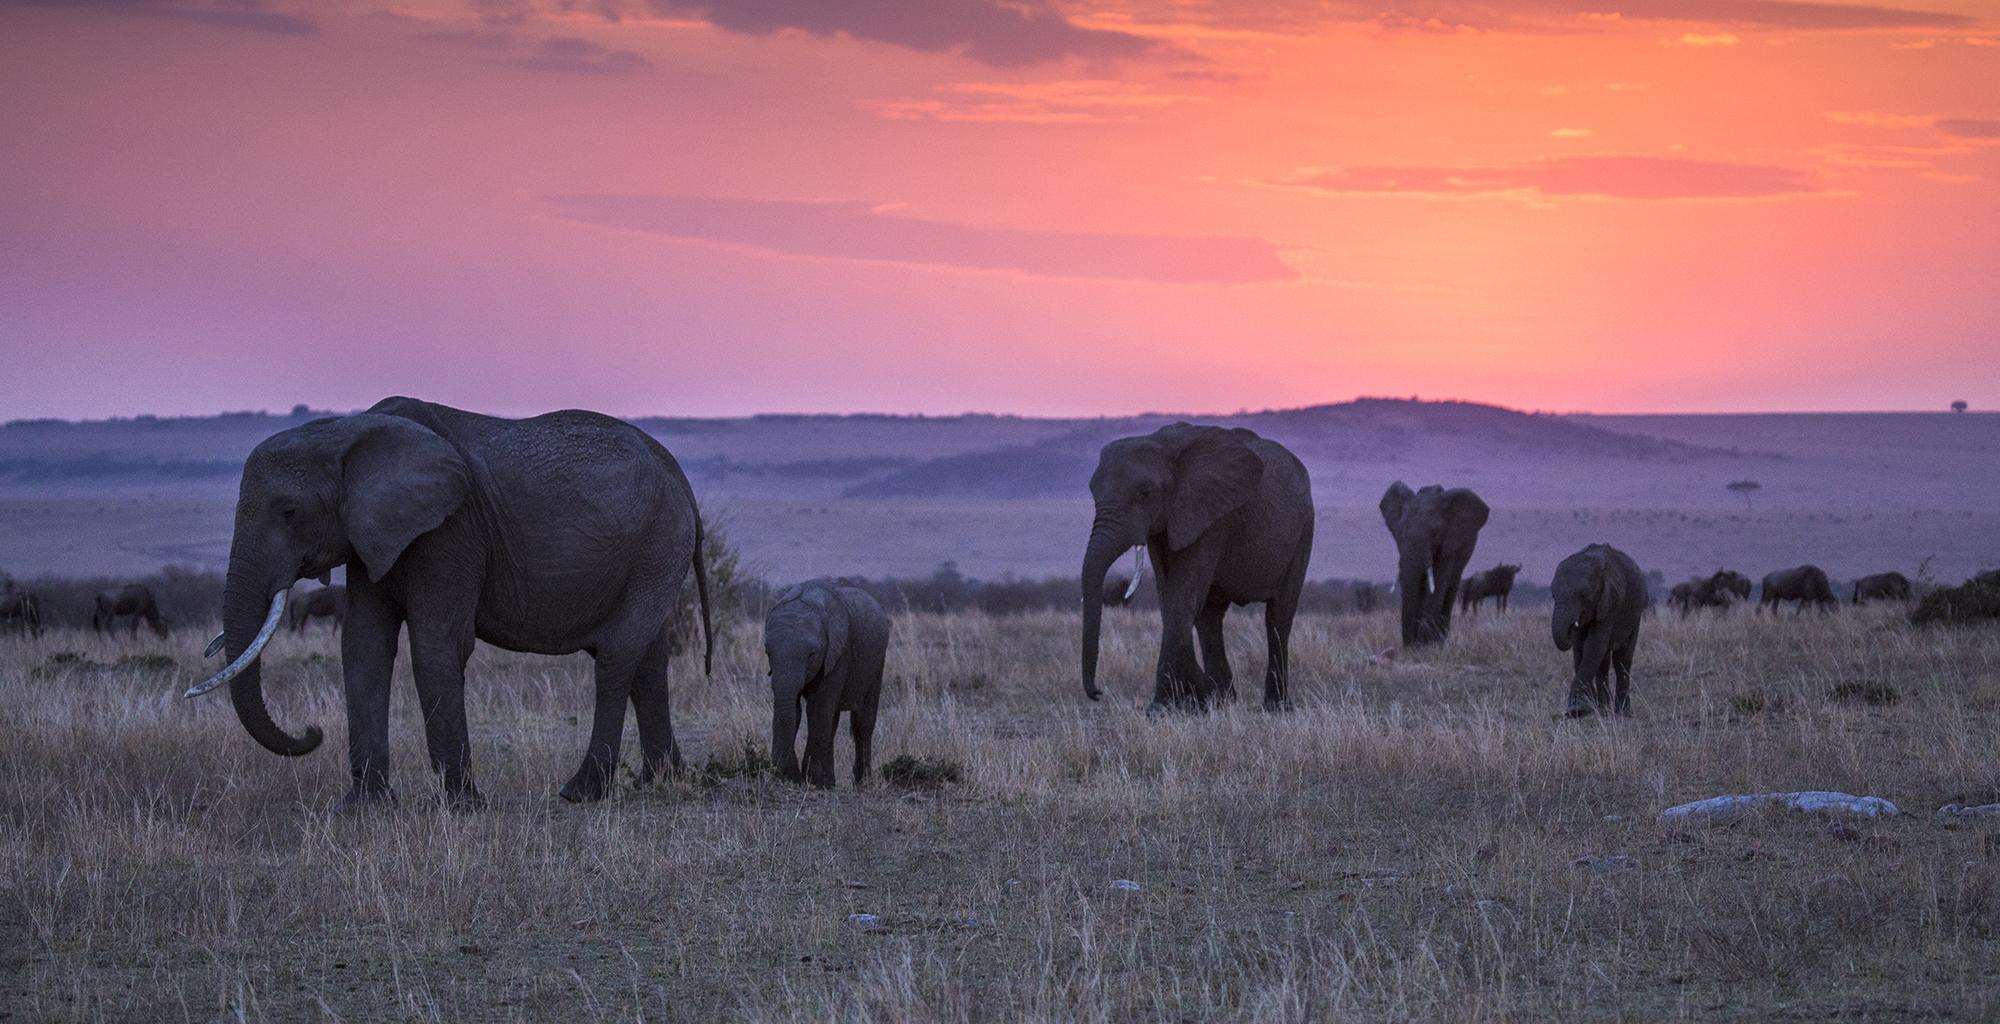 Kenya-Mara-Expedition-Camp-Elephant